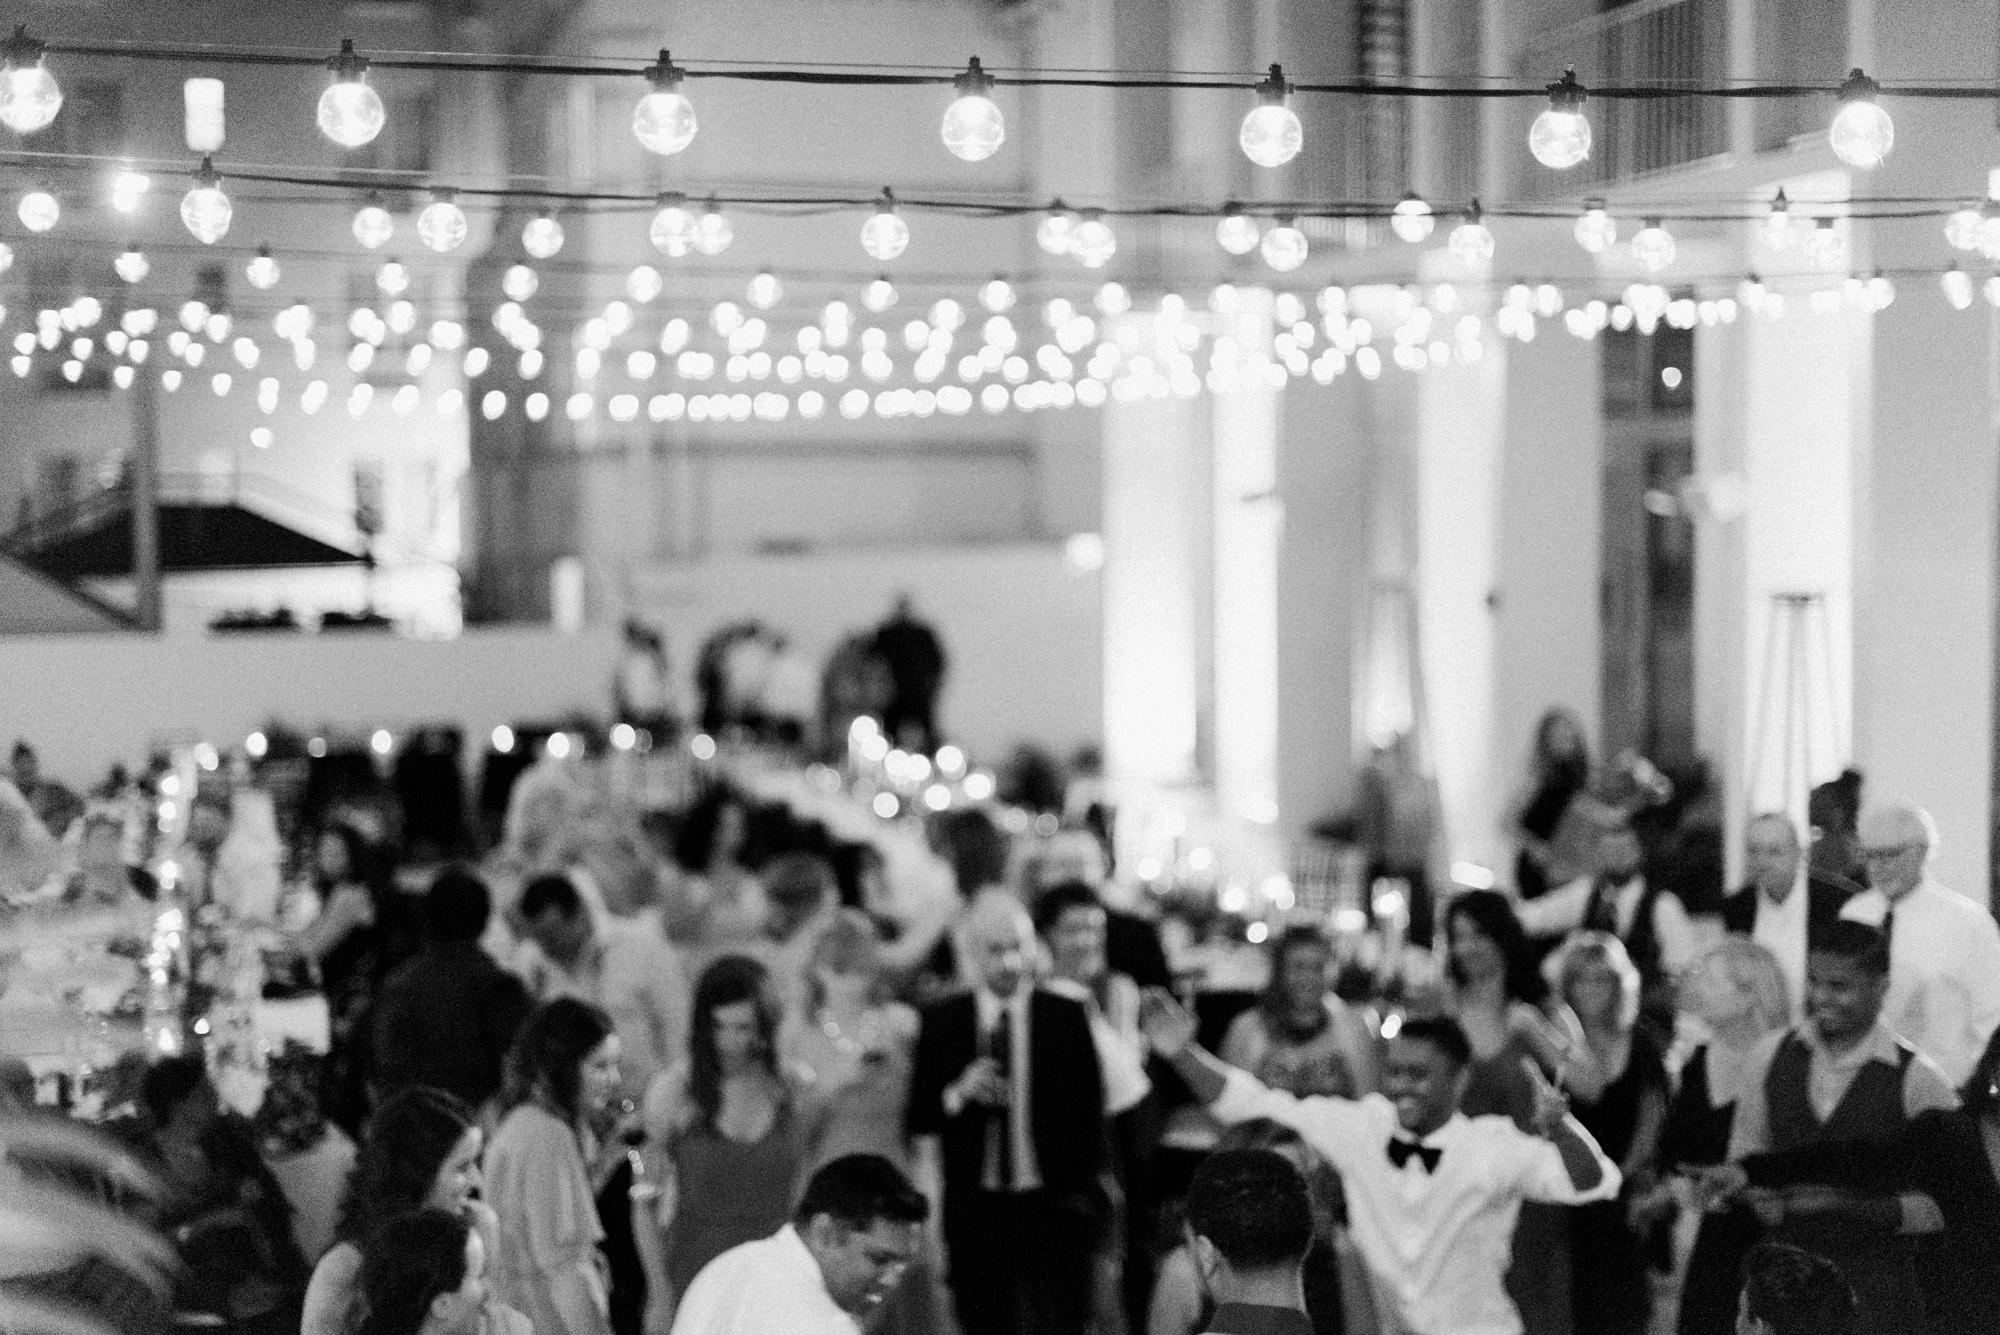 betsy-hotel-wedding-south-beach-miami-charleston-south-carolina-destination-wedding-photographer-36.jpg